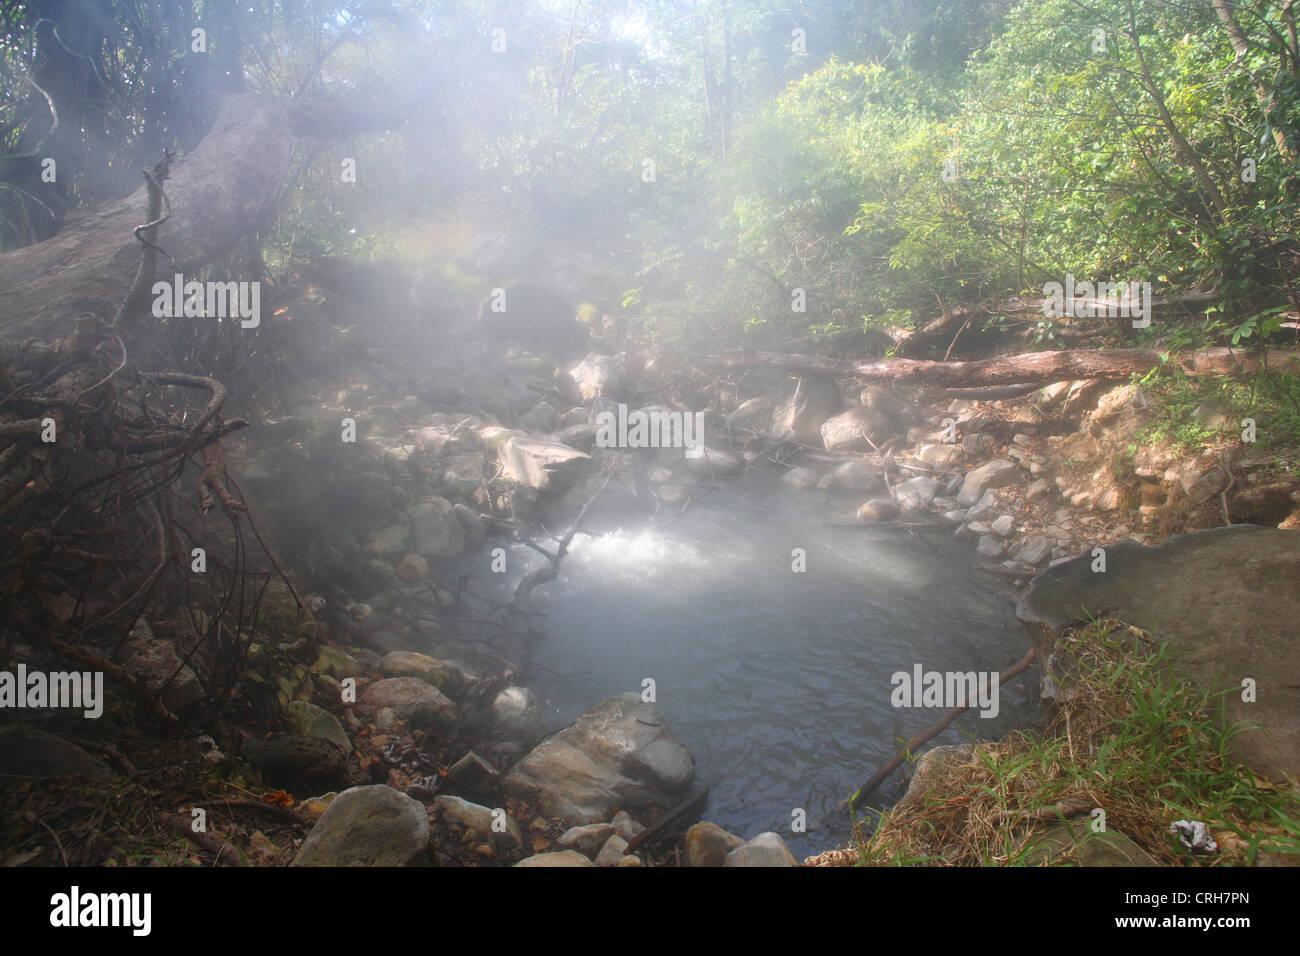 Vulkanische Fumarole im Regenwald. Las Pailas Trail, Rincon De La Vieja Nationalpark, Guanacaste, Costa Rica. Stockbild